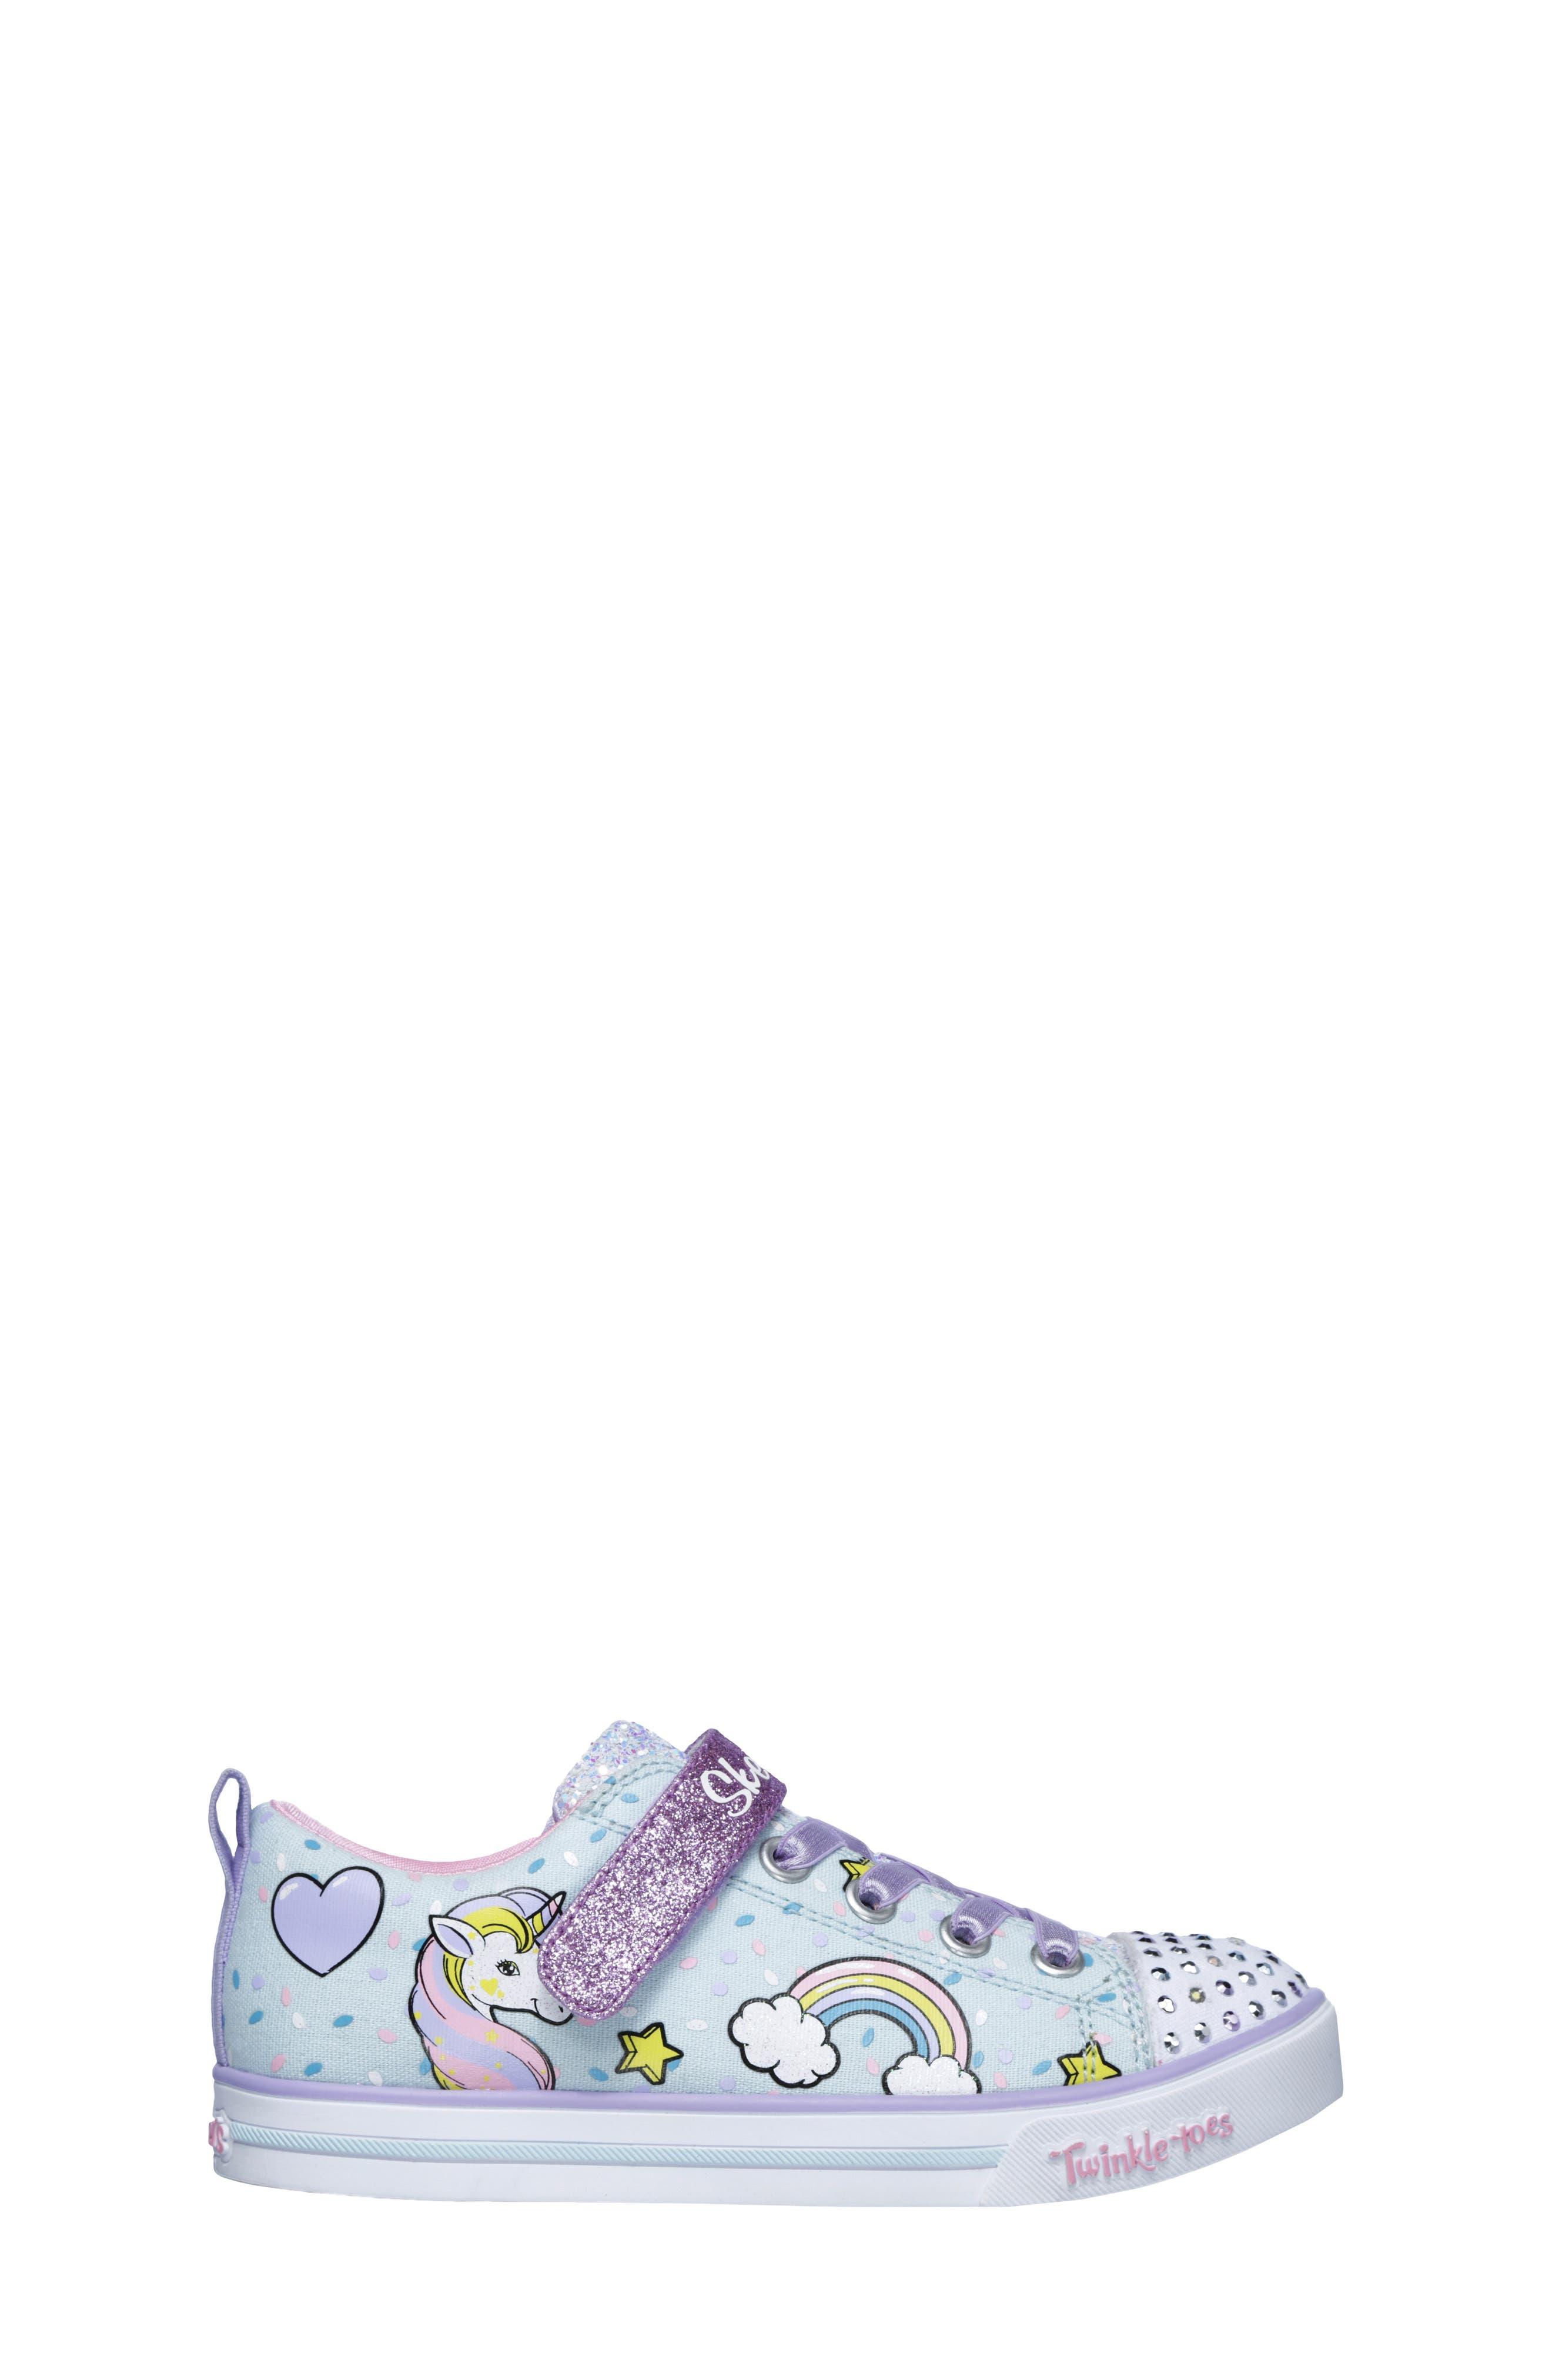 Twinkle Toes Unicorn Light-Up Sneaker,                             Alternate thumbnail 3, color,                             LIGHT BLUE/ MULTI